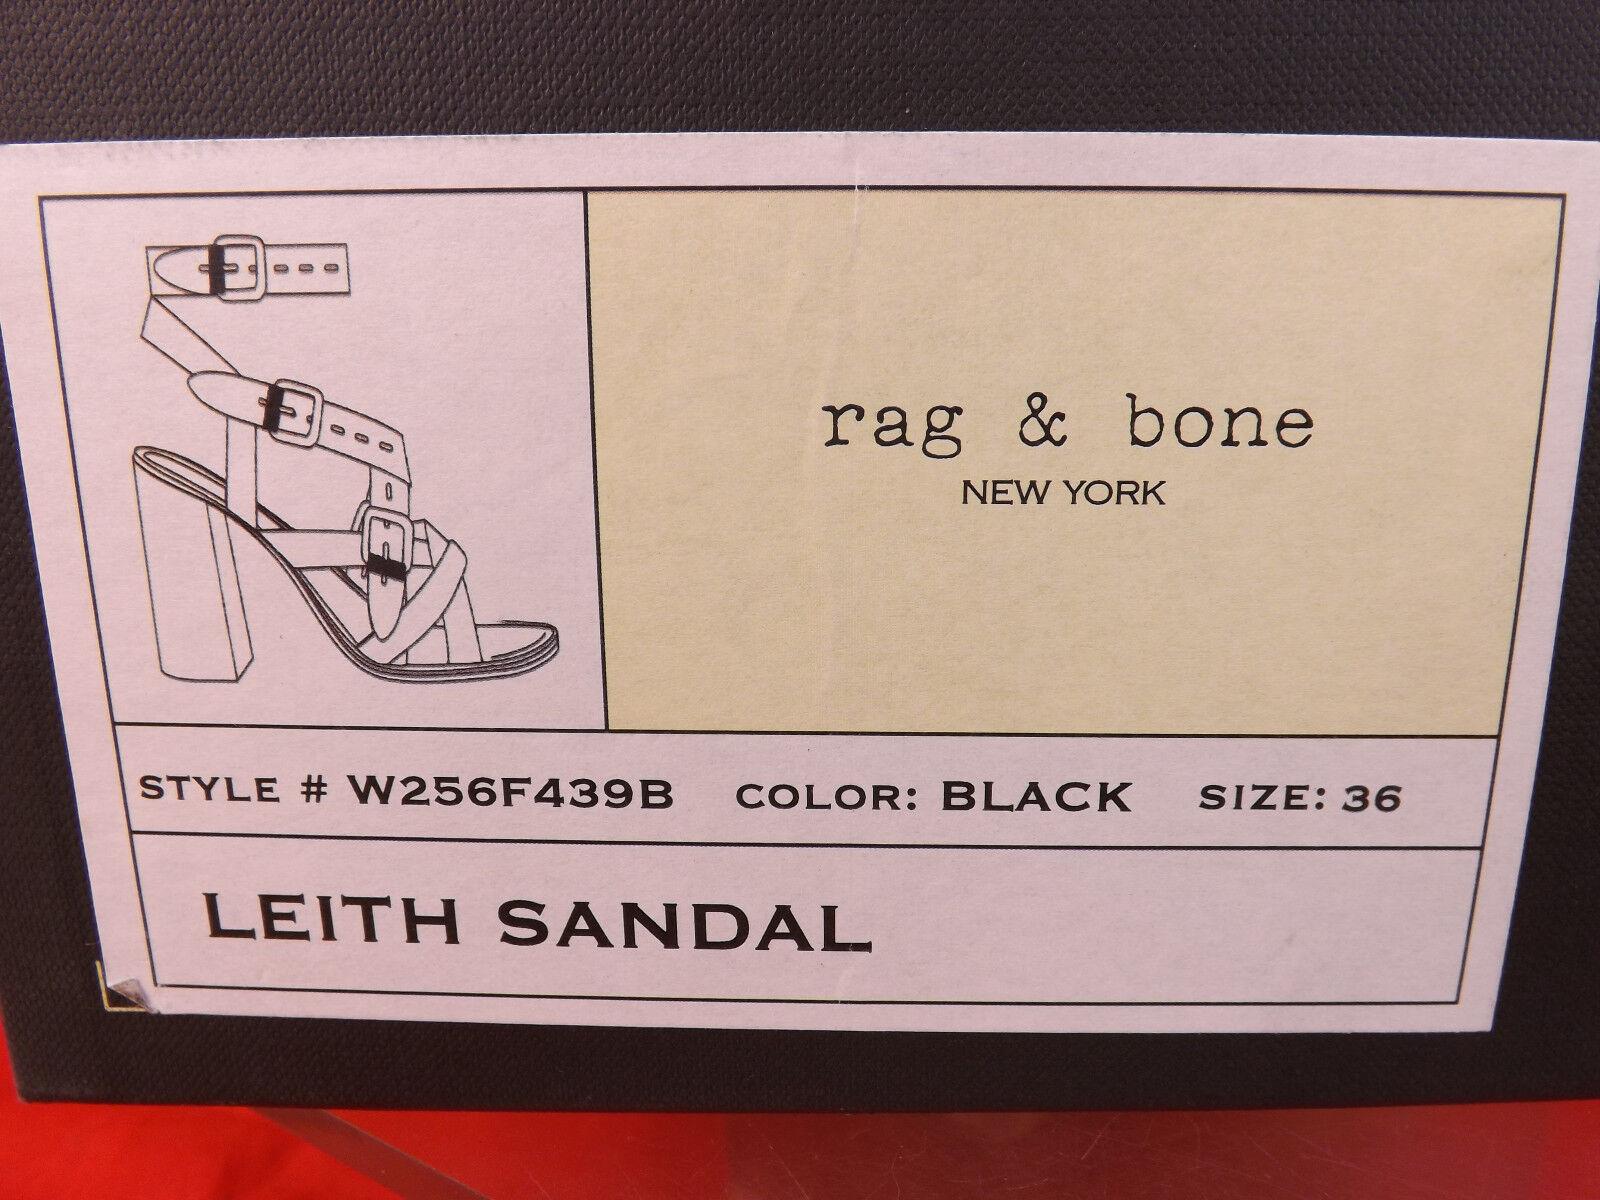 Nuevo En En En Caja Rag & Bone Gamuza Cuero Negro Leith Correas Talón Sandalias 36 Criss Cross 97662a